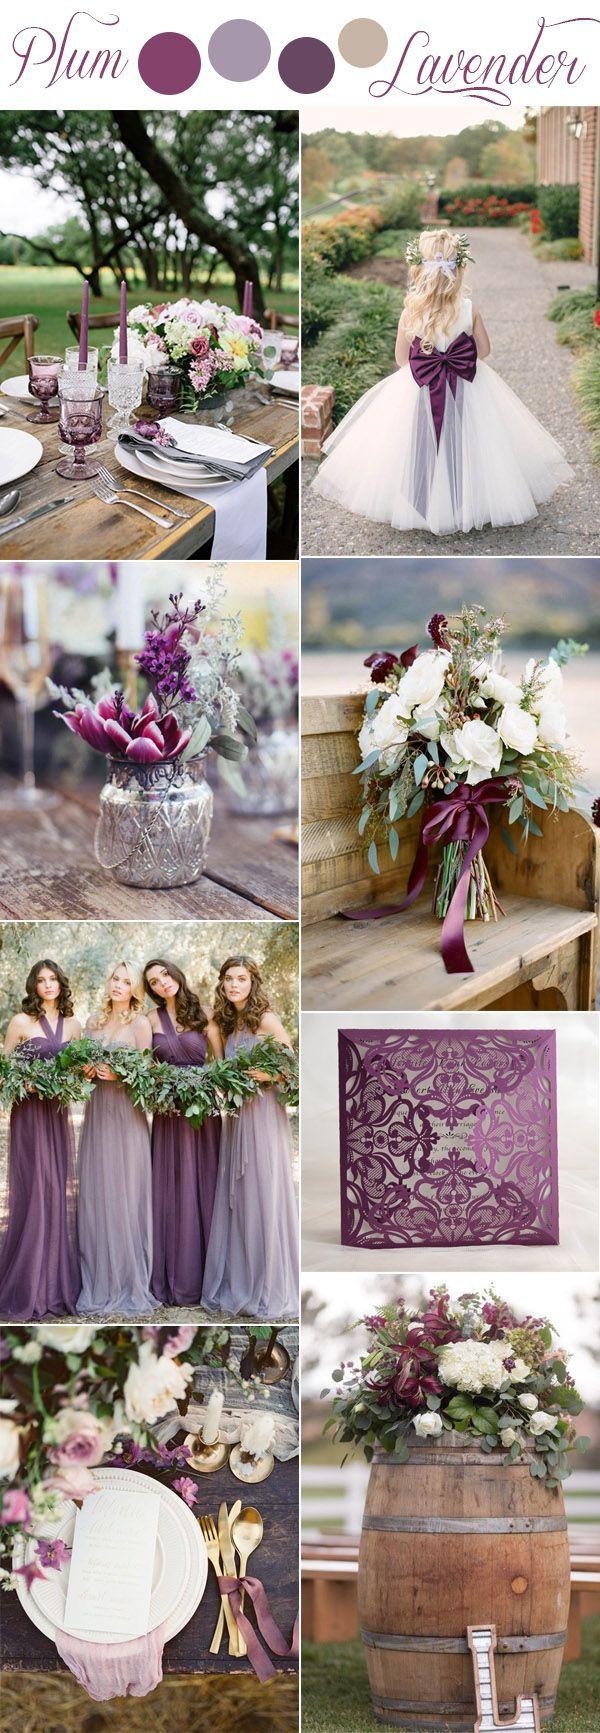 plum, lavender and lilac shades of purple romantic rustic wedding ...